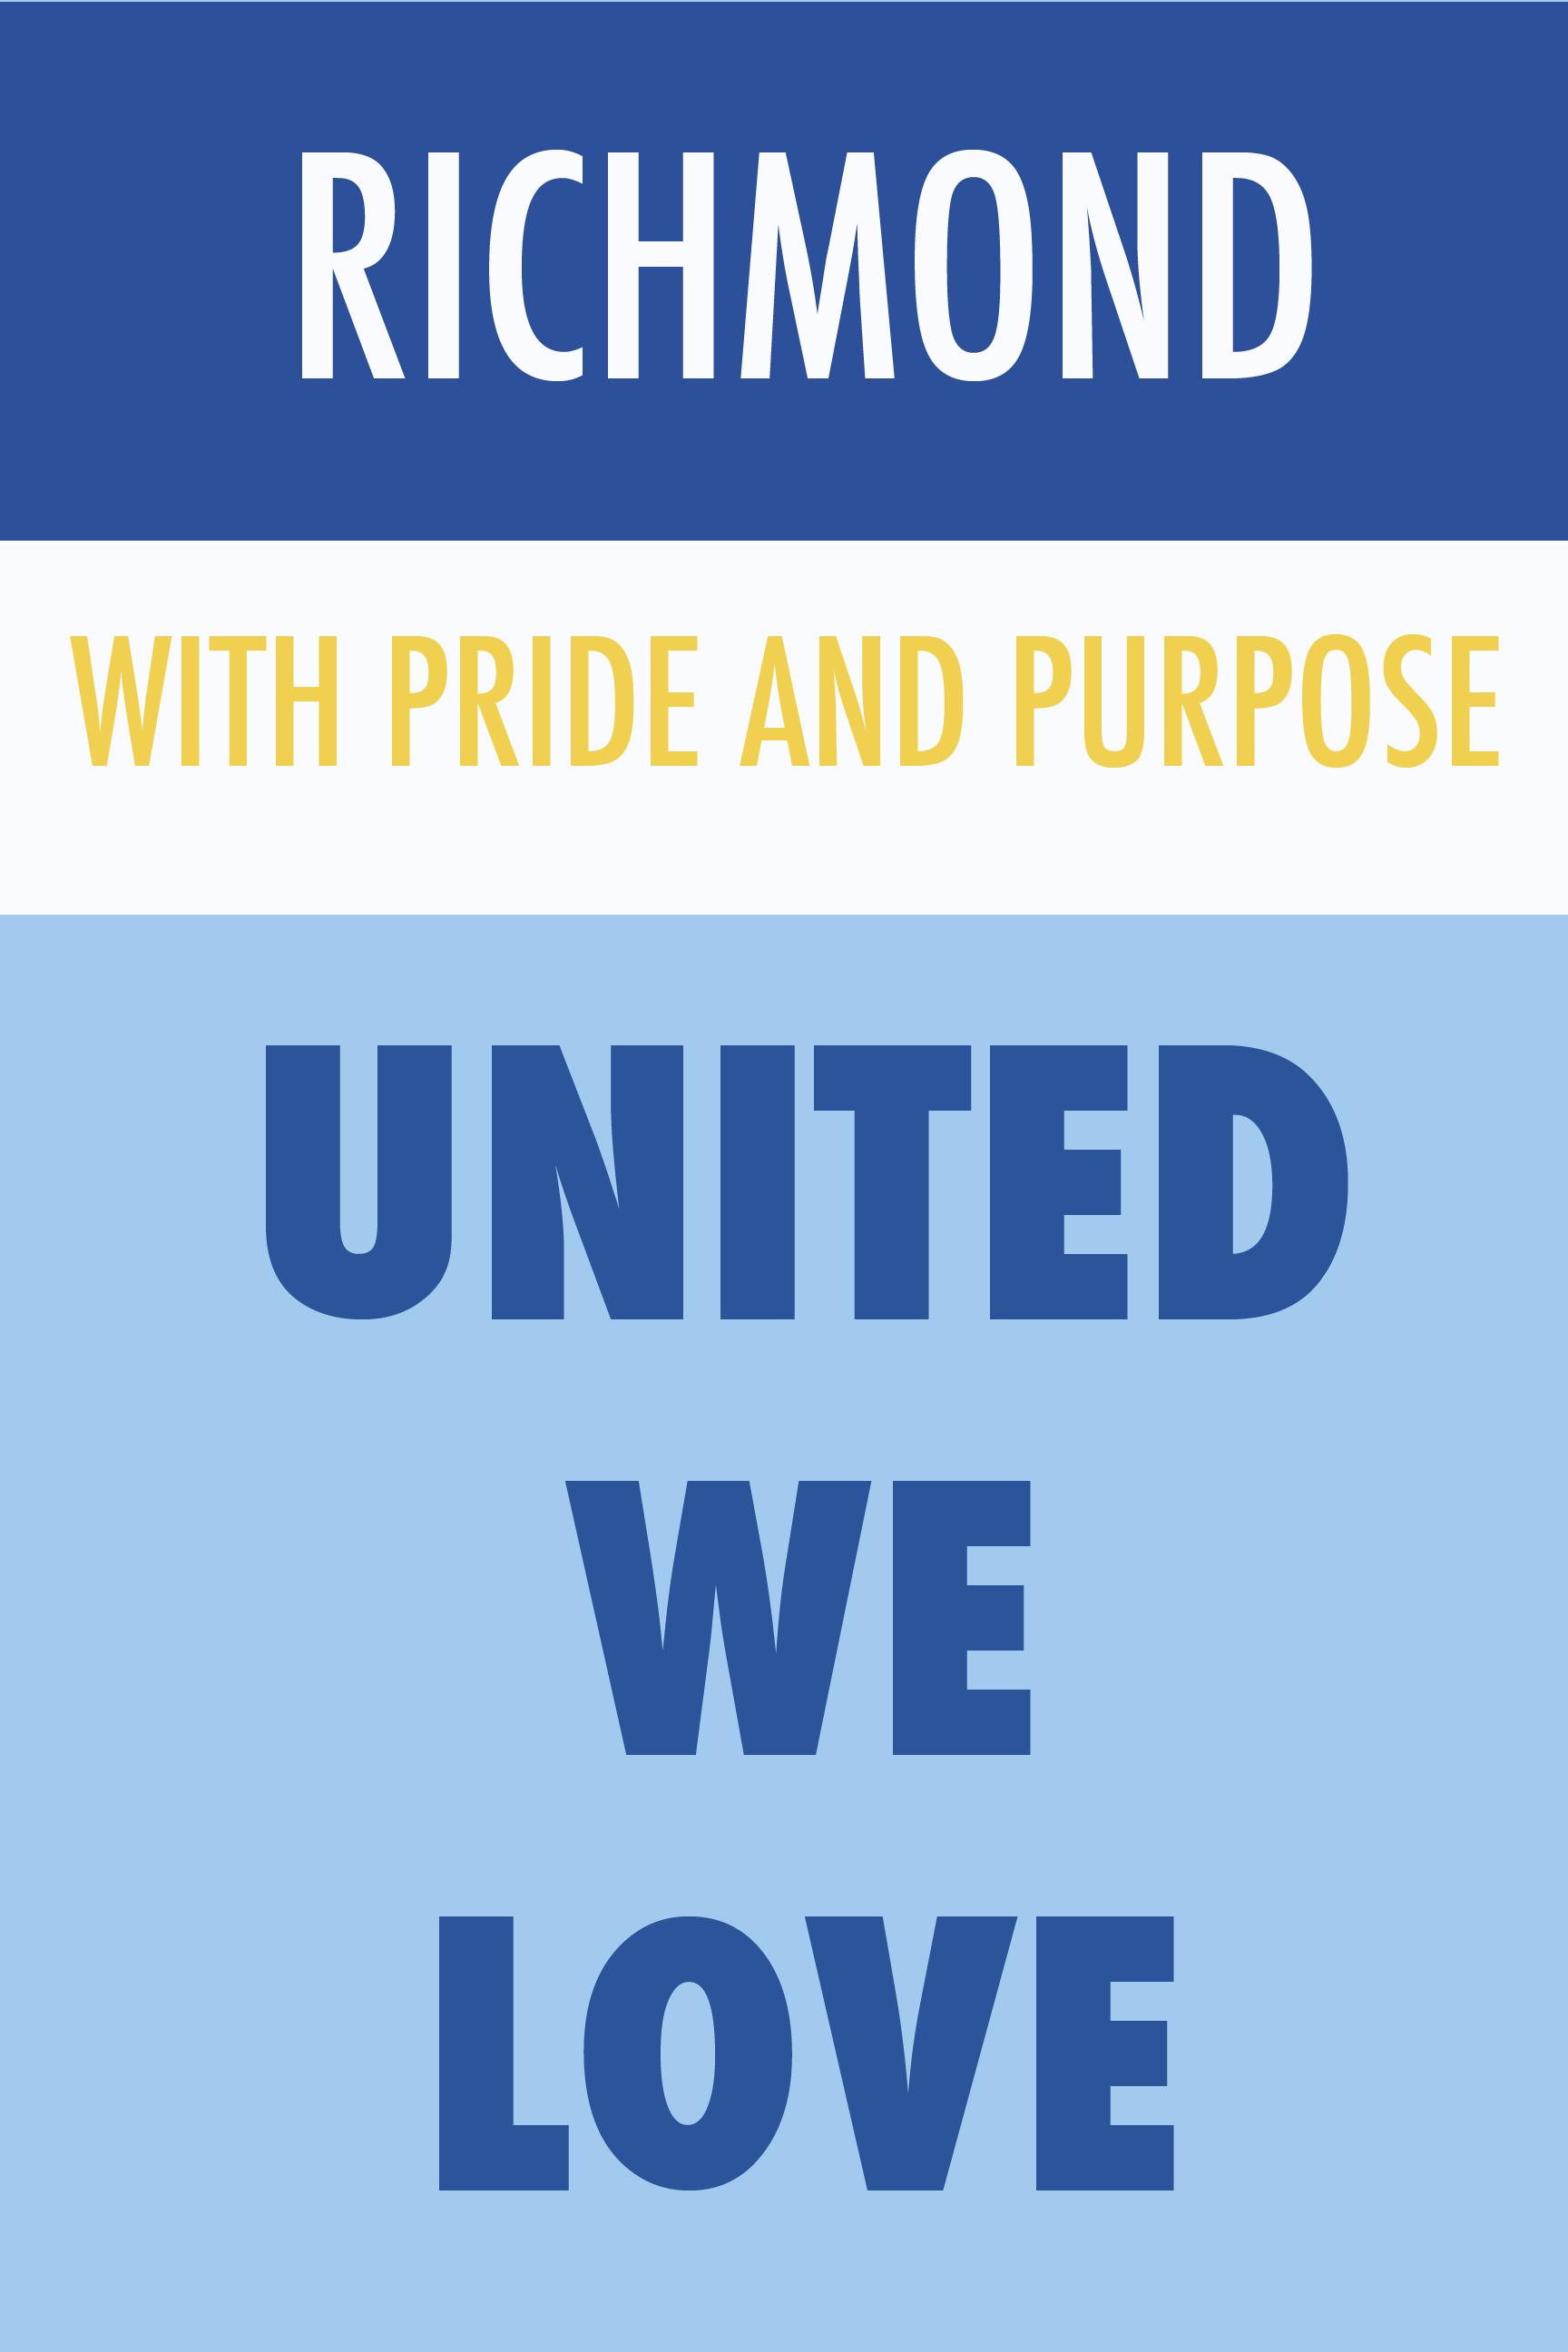 UNITED WE LOVE.jpg